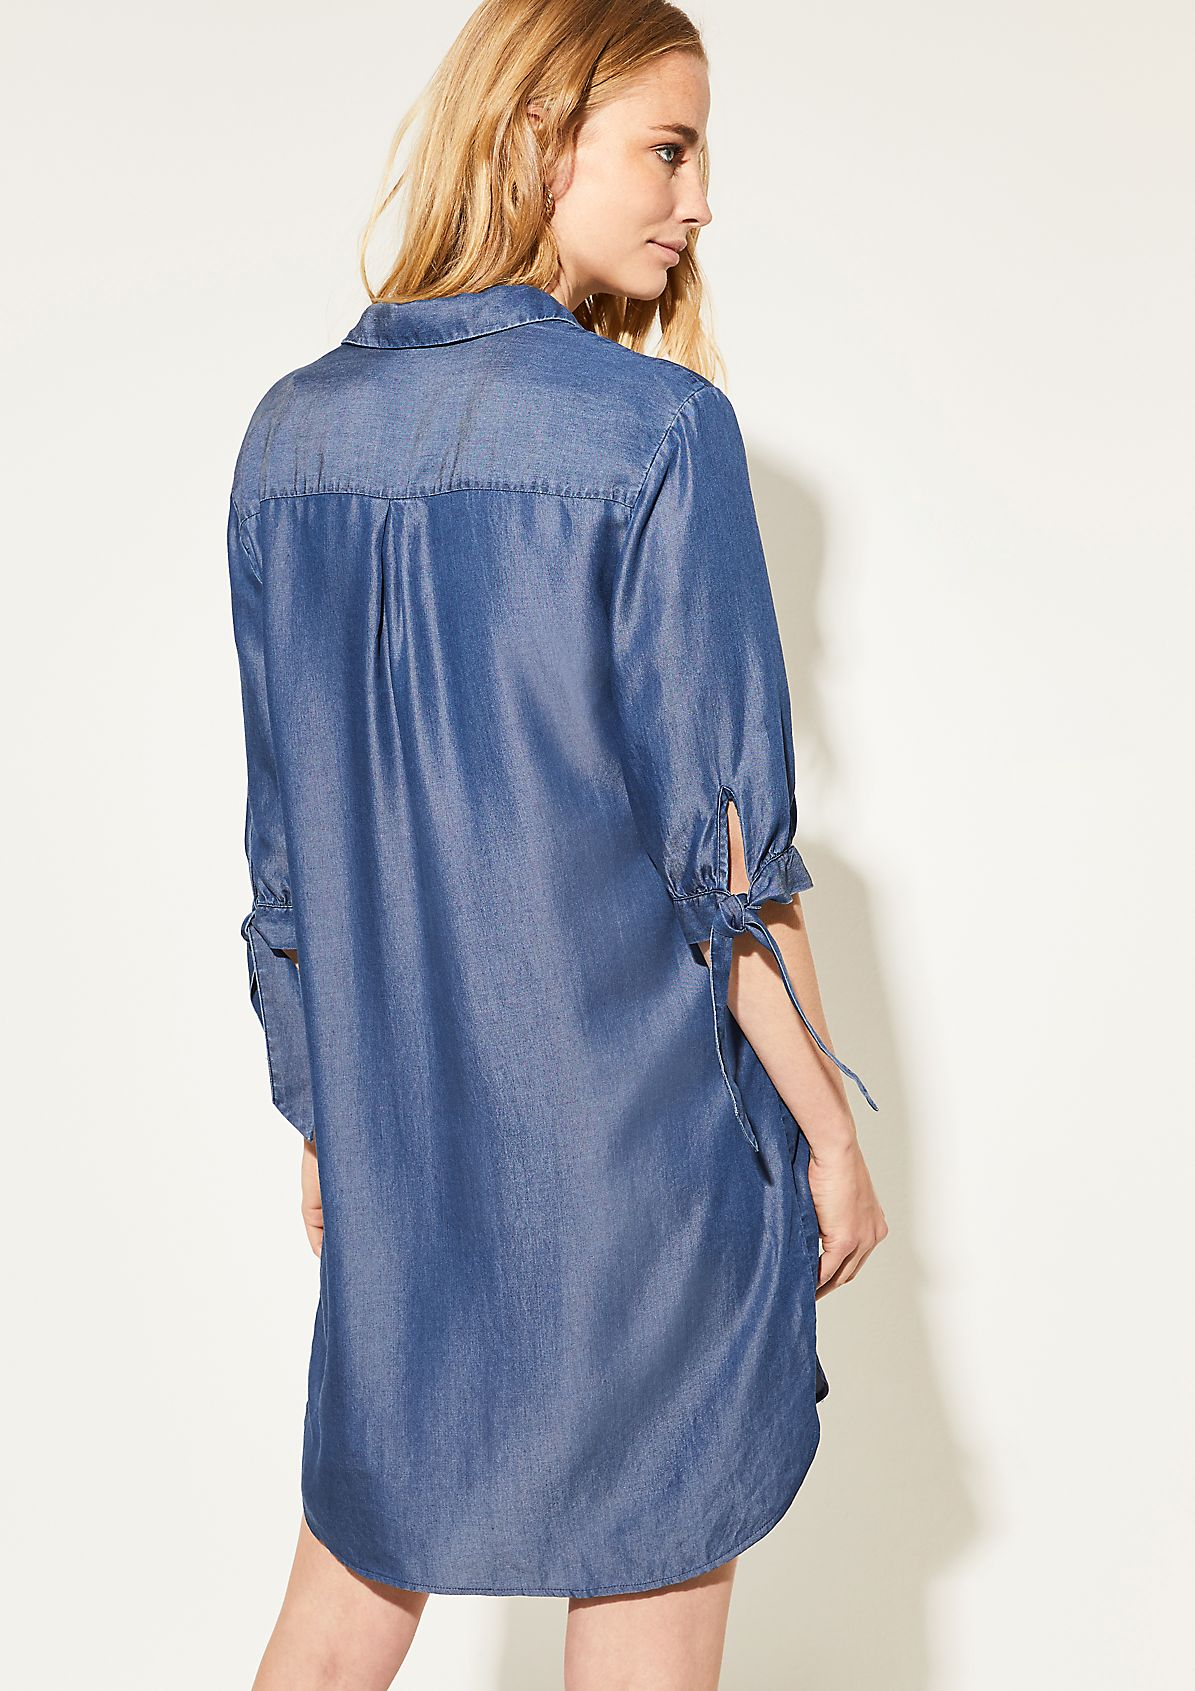 Light Denim-Kleid aus Lyocell